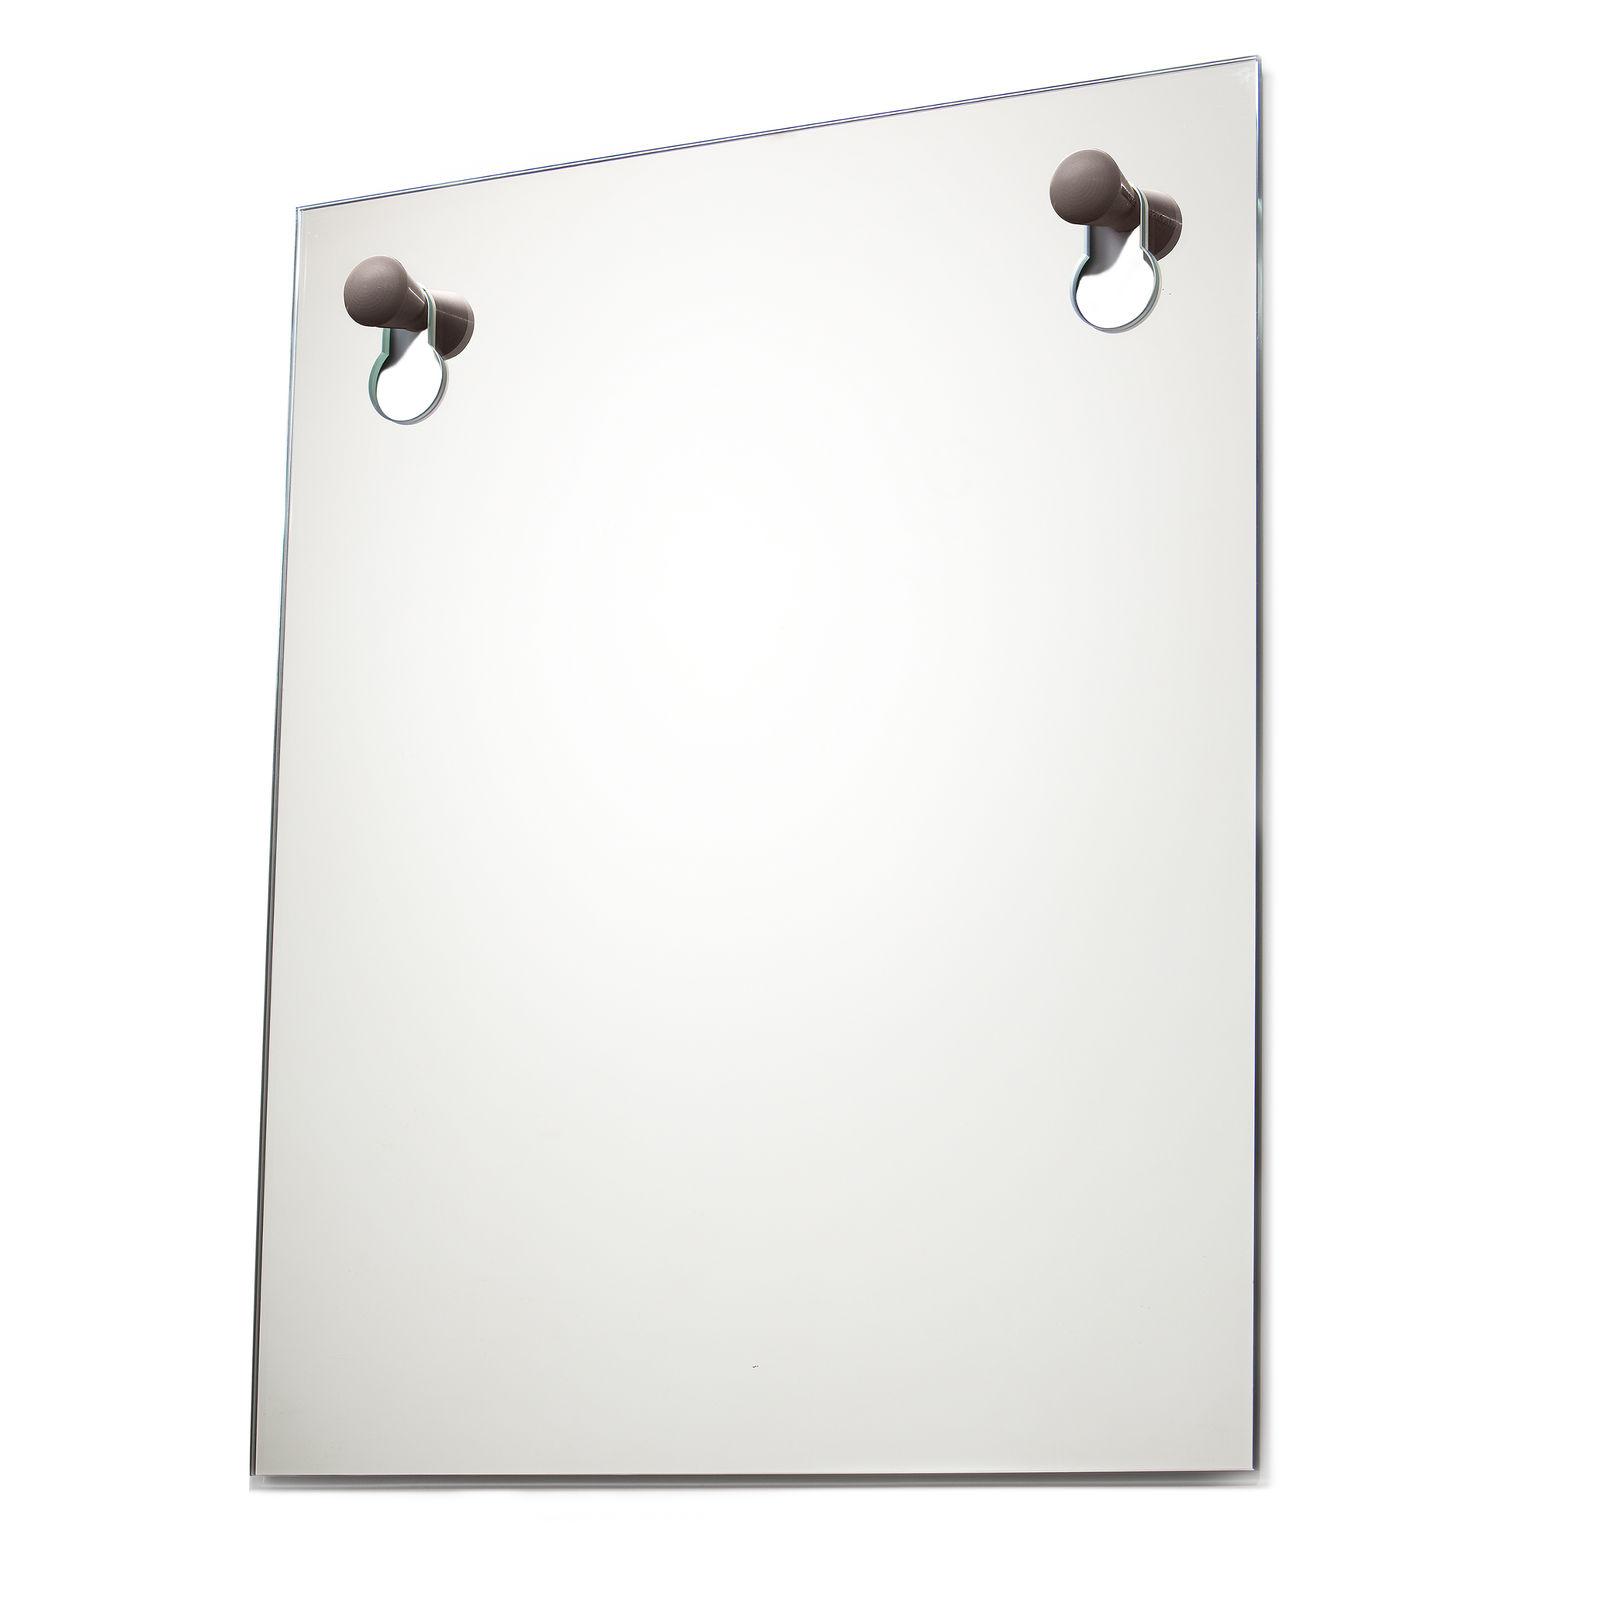 Knobble spiegel Goods bruin groot